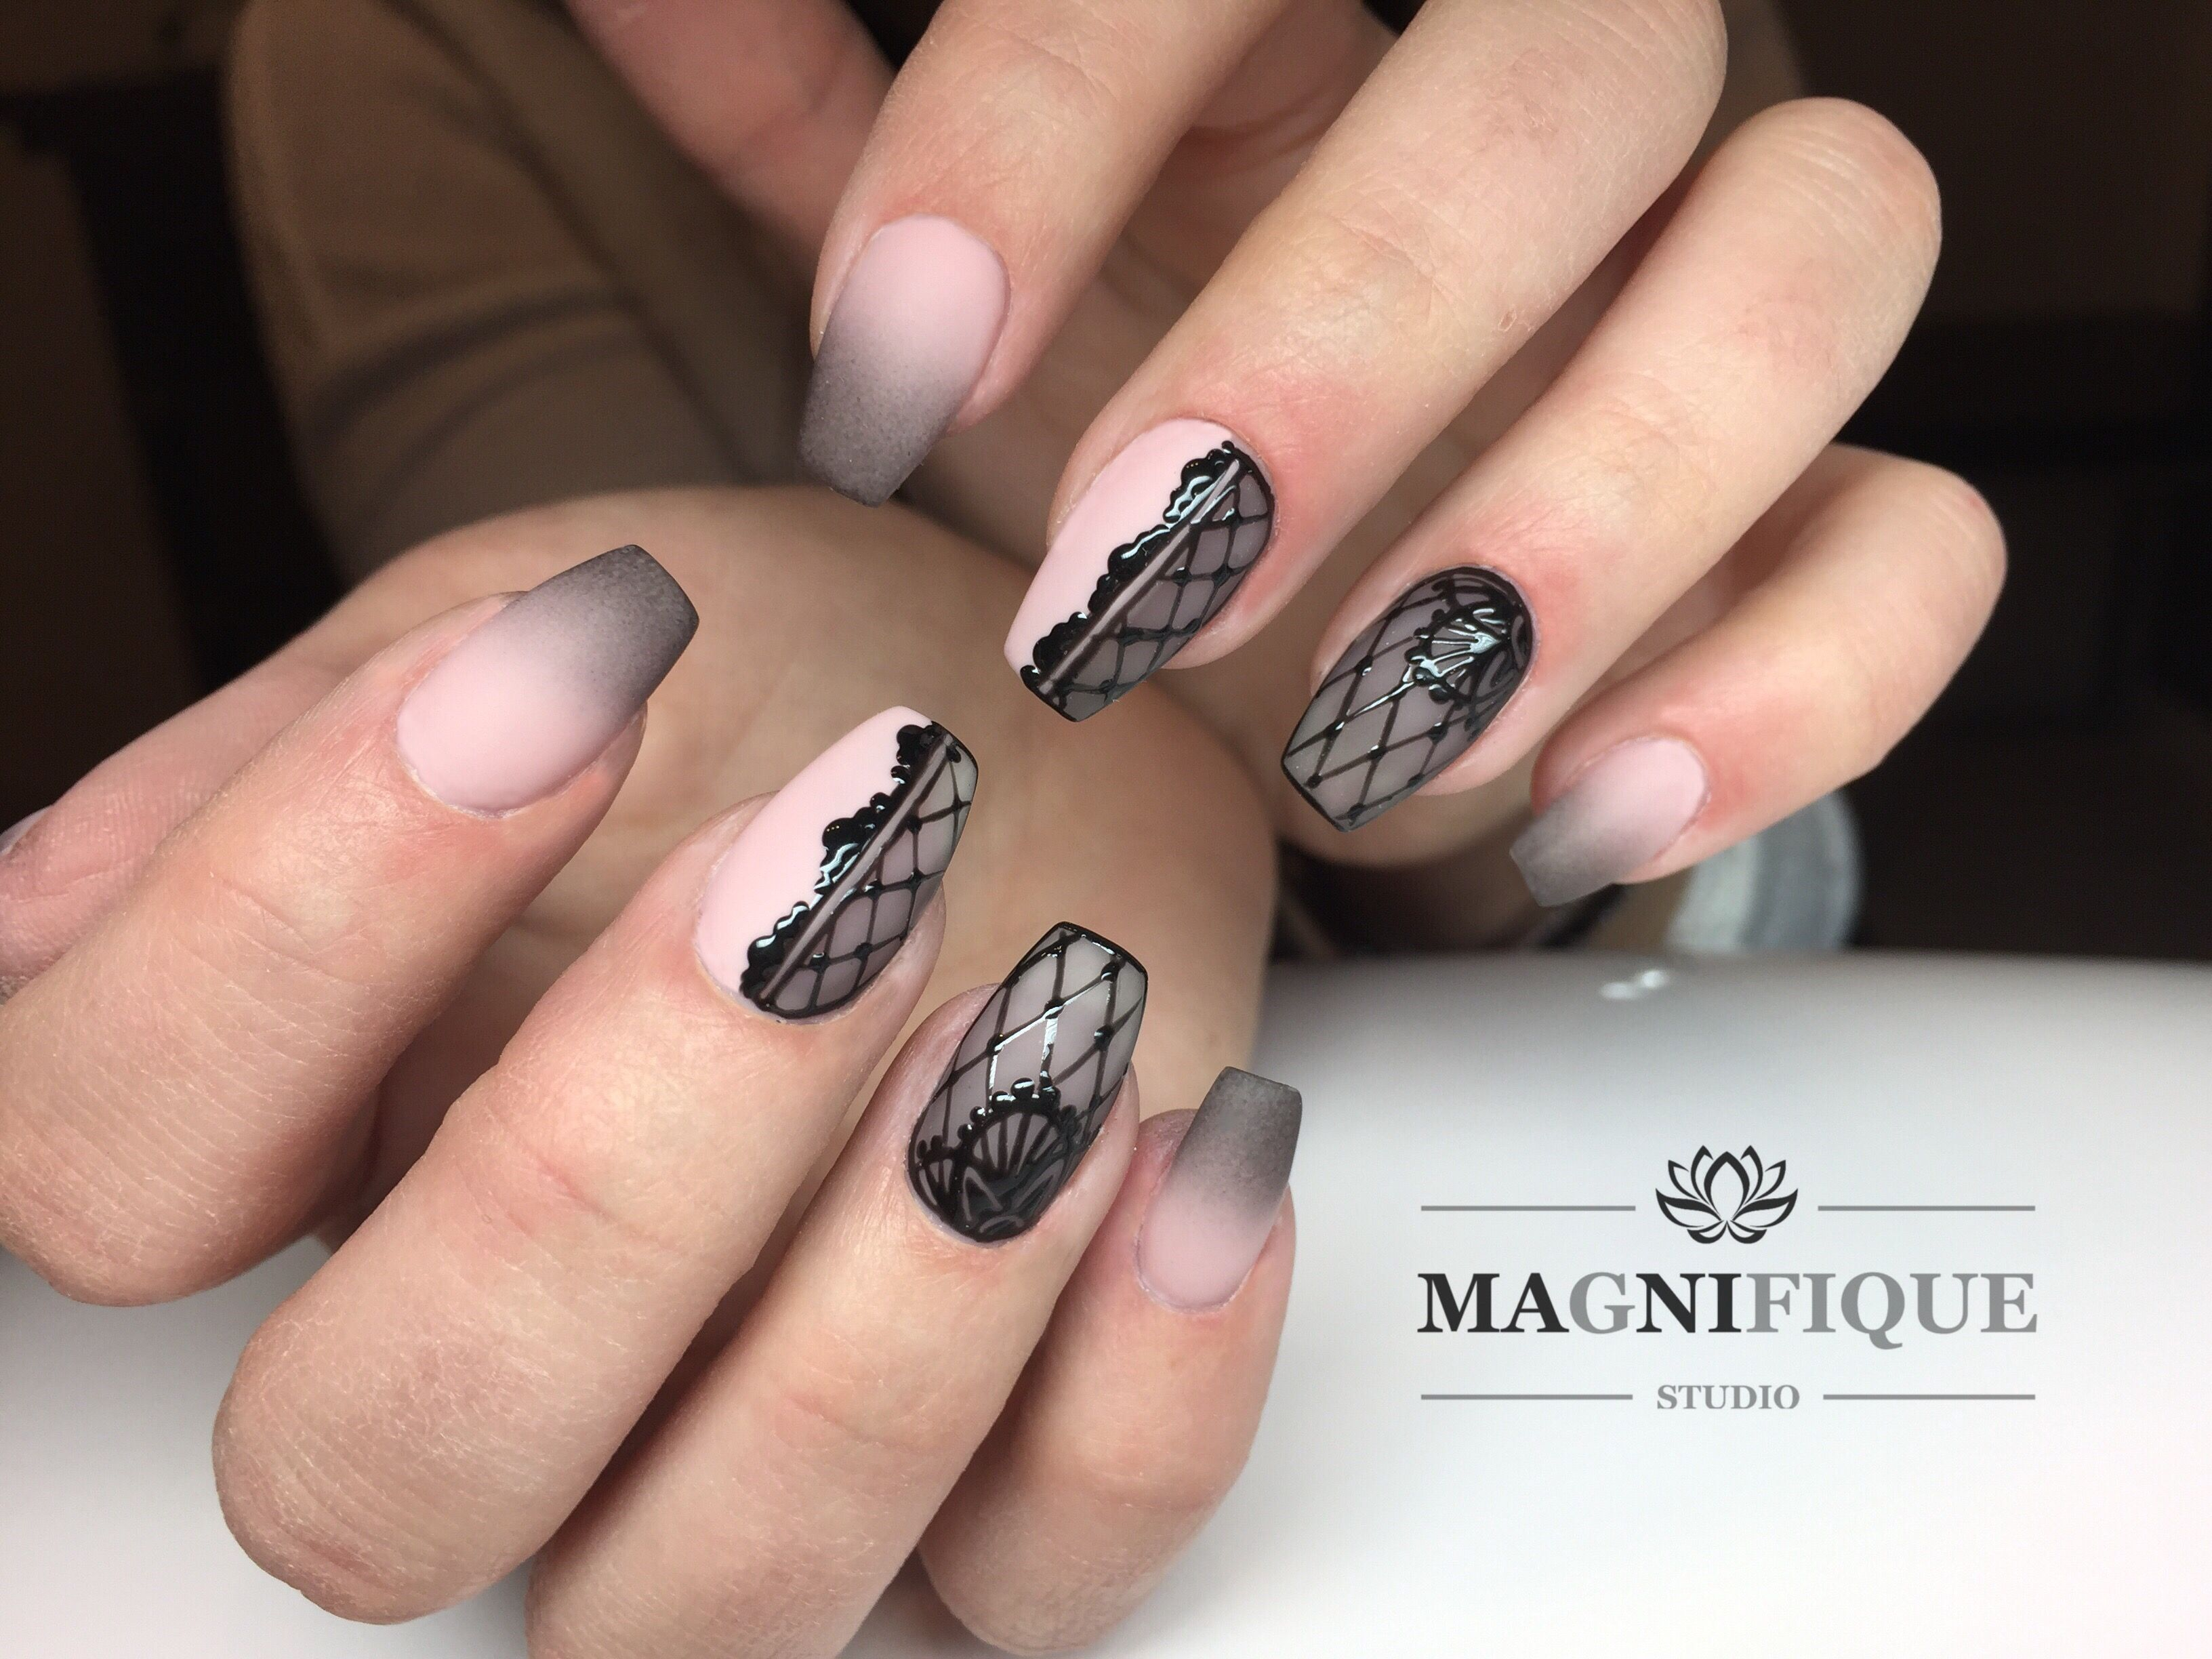 Ombre Nails Nail Art Design Black Lace Nails Lace Nail Art